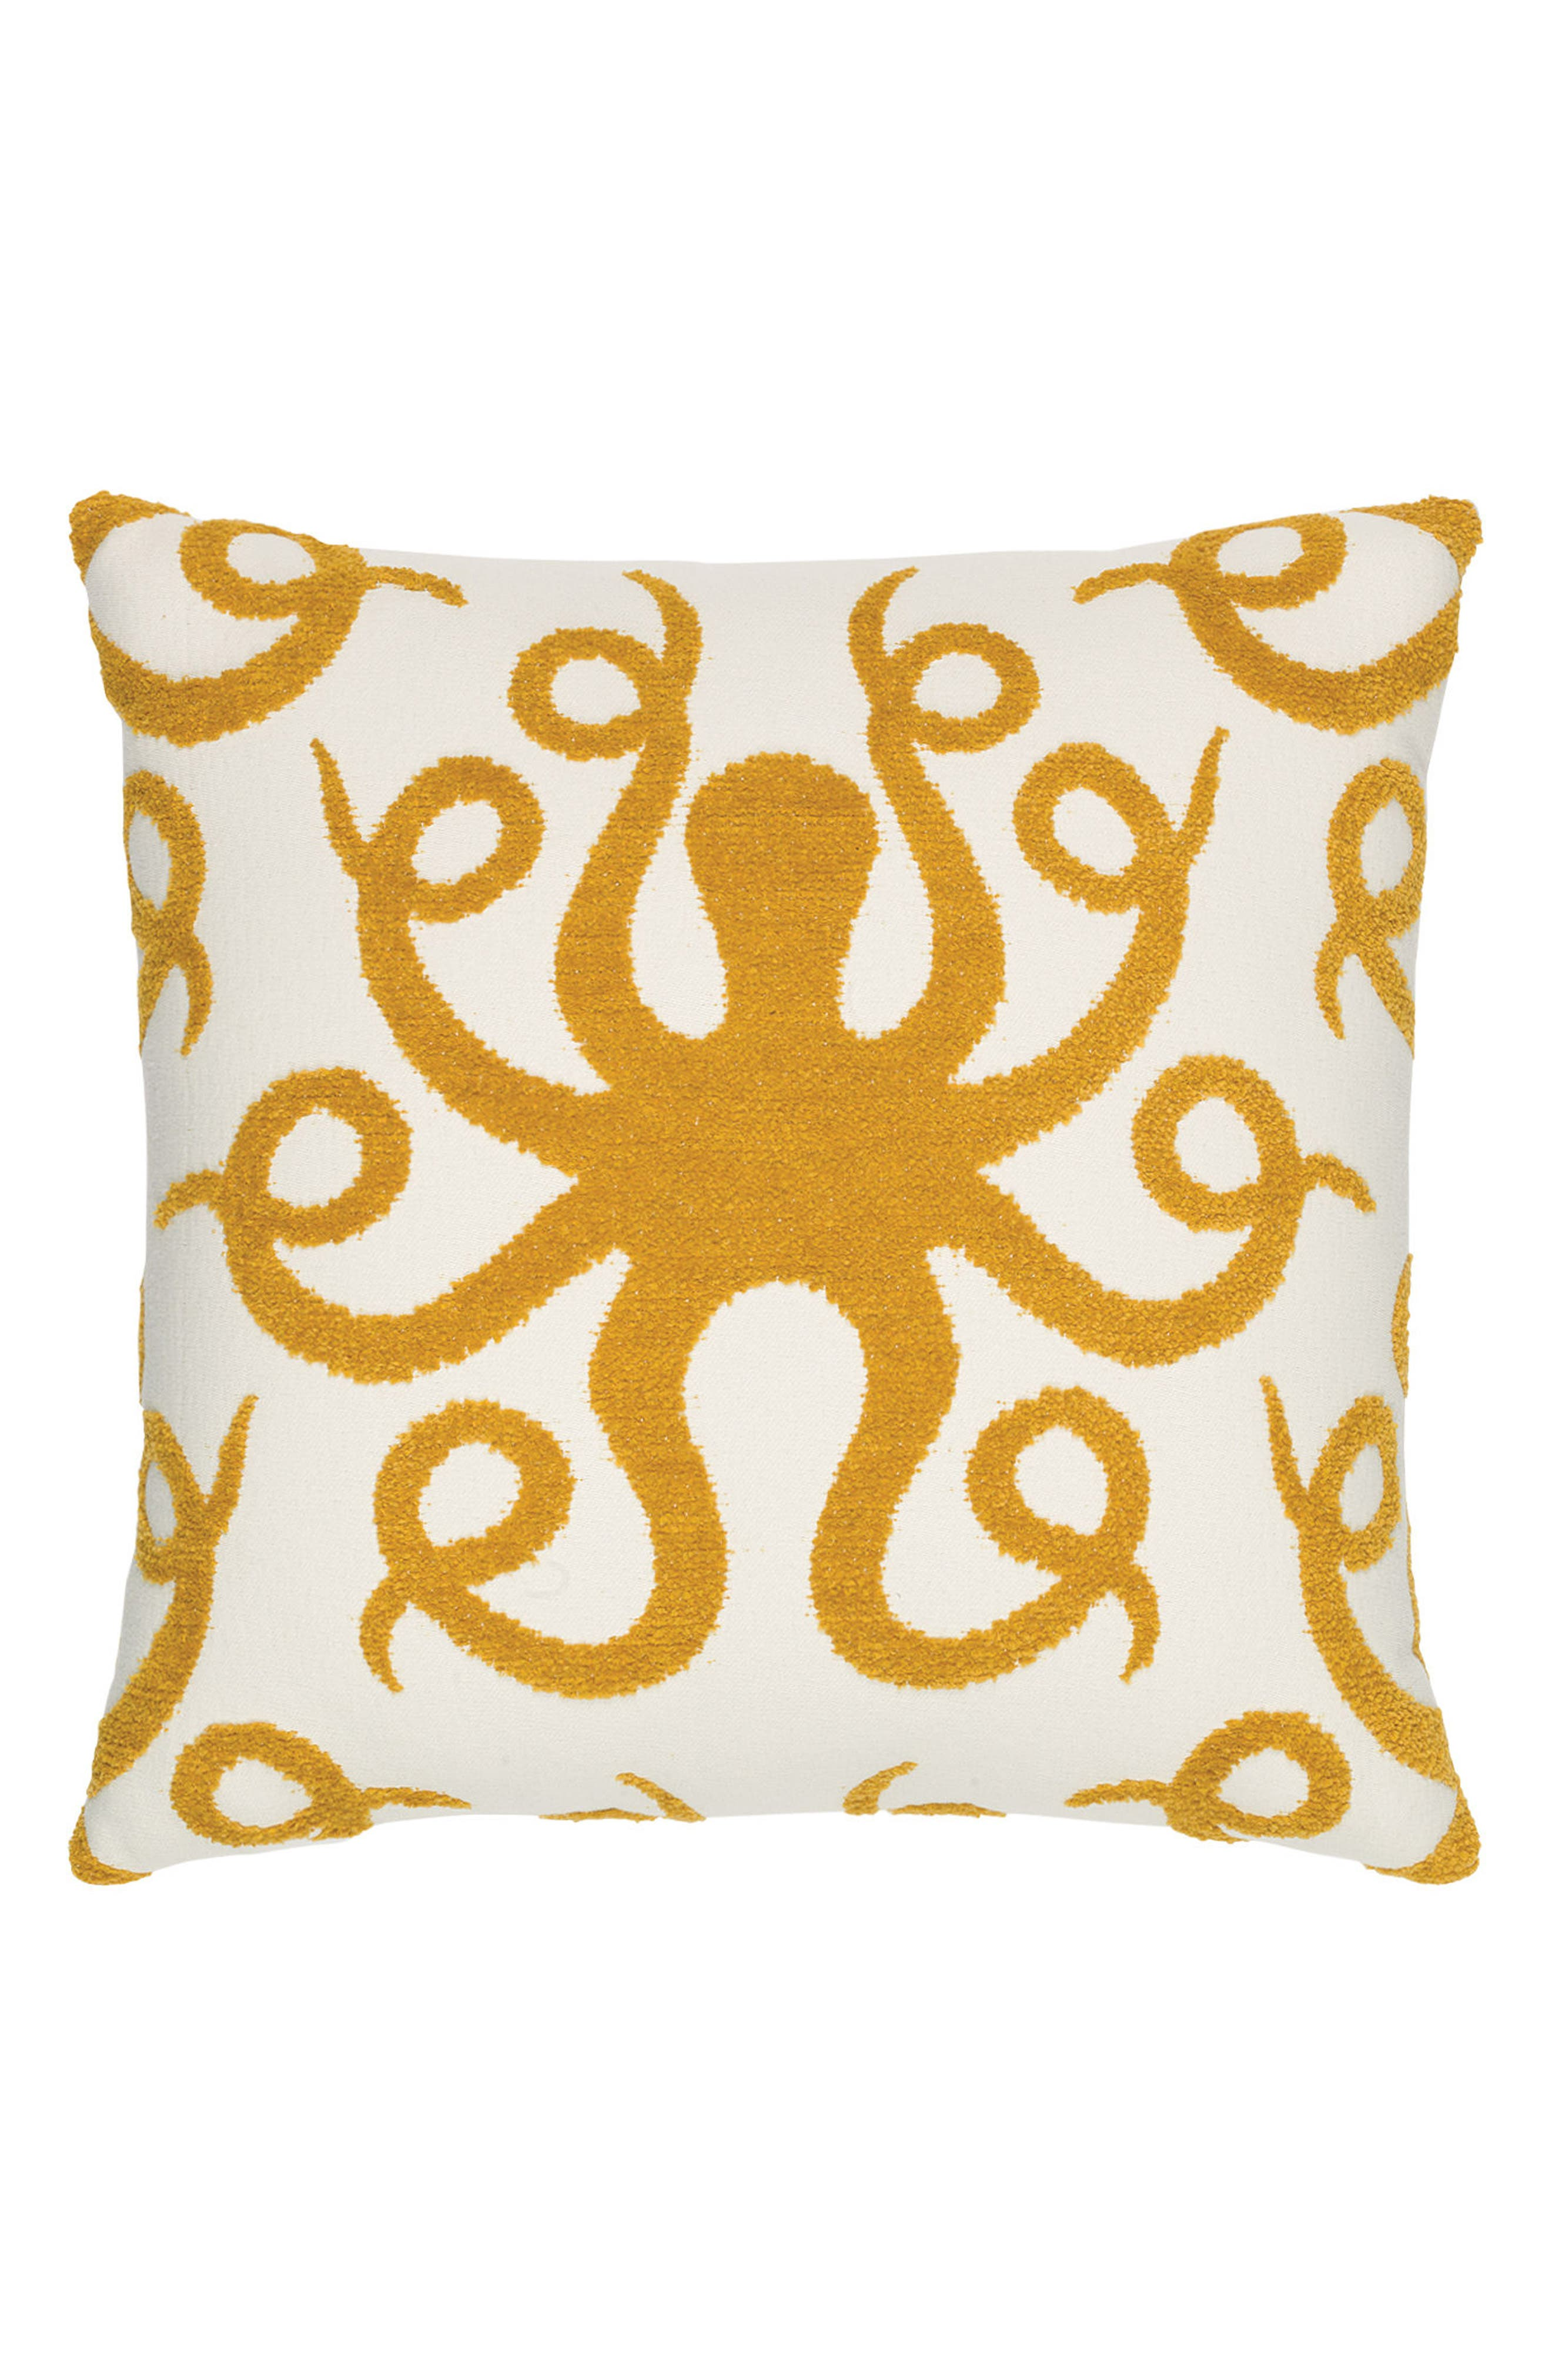 Main Image - Elaine Smith Octoplush Indoor/Outdoor Accent Pillow